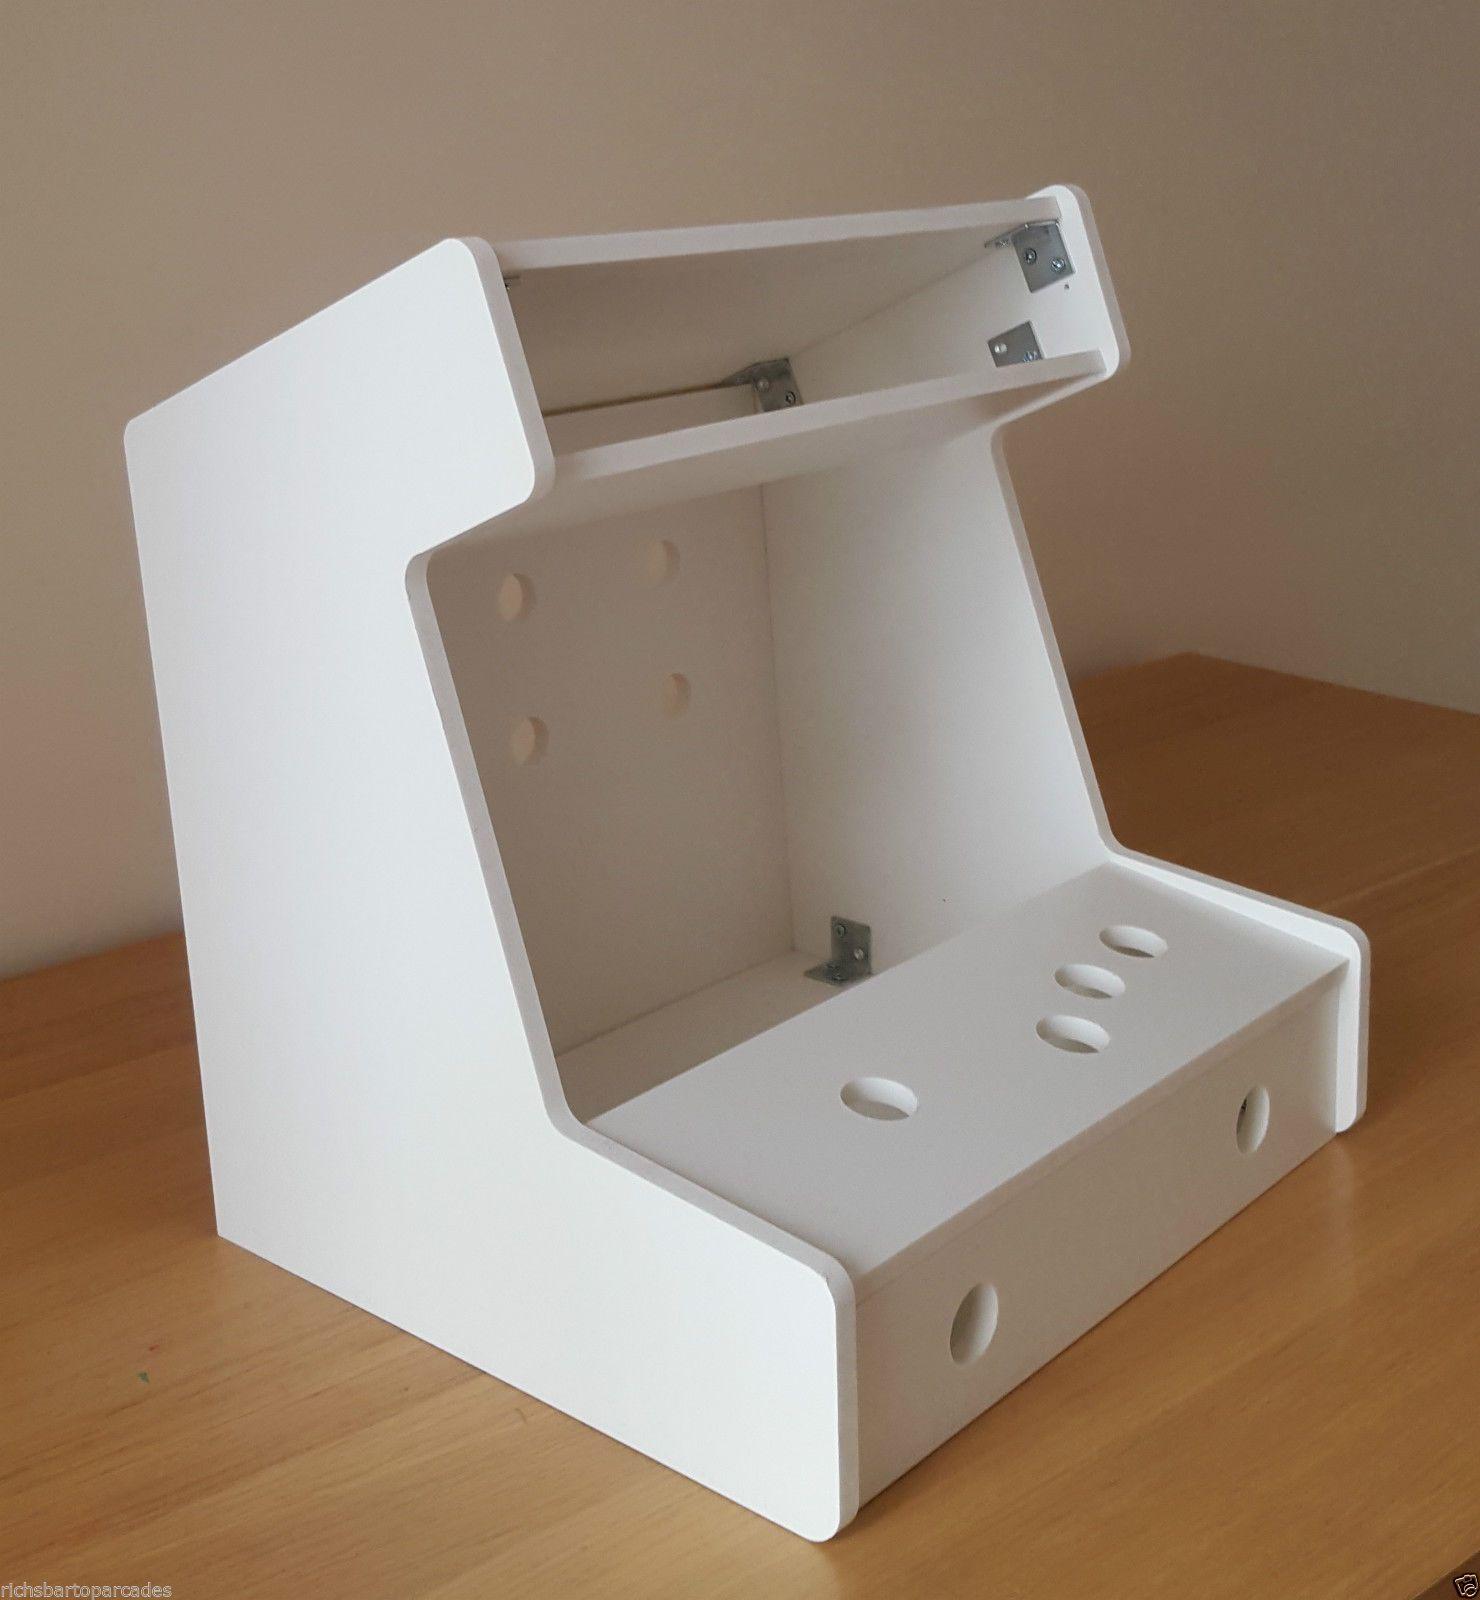 Miniature Mini Bartop Arcade Machine Pvc 1 Player Diy Flat